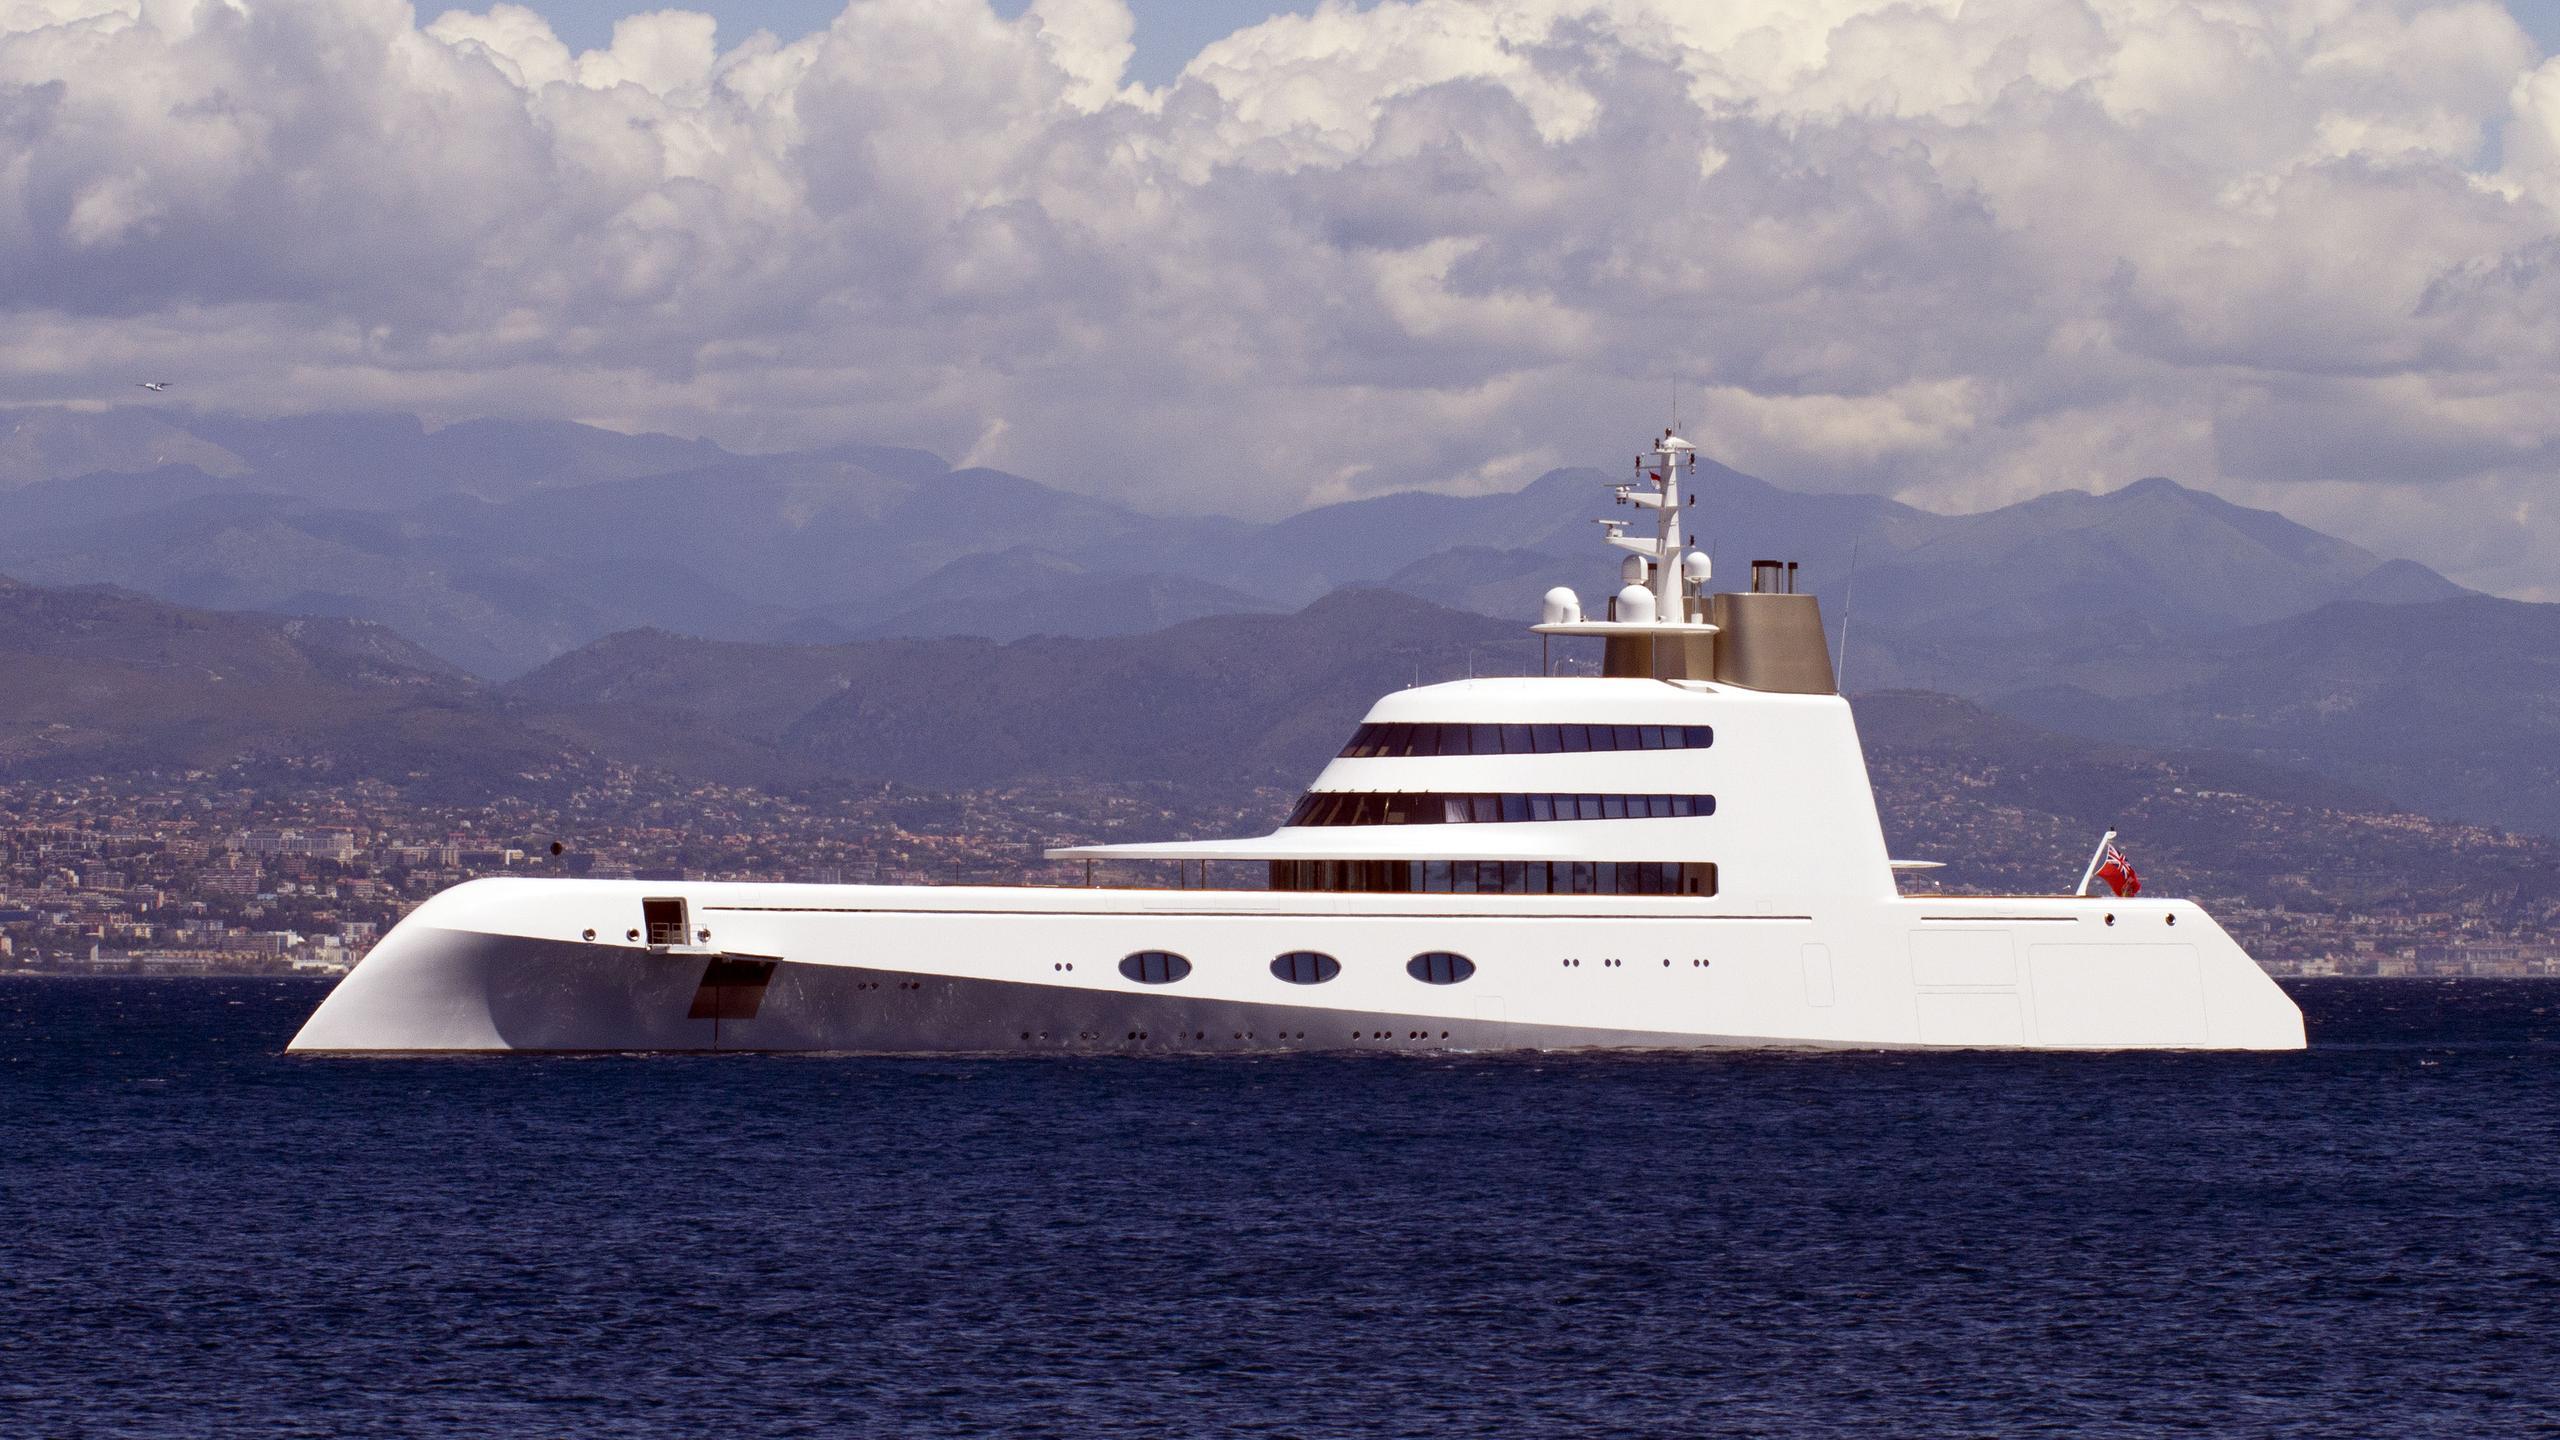 superyacht-a-motor-yacht-blohm-voss-2008-119m-profile-anchored